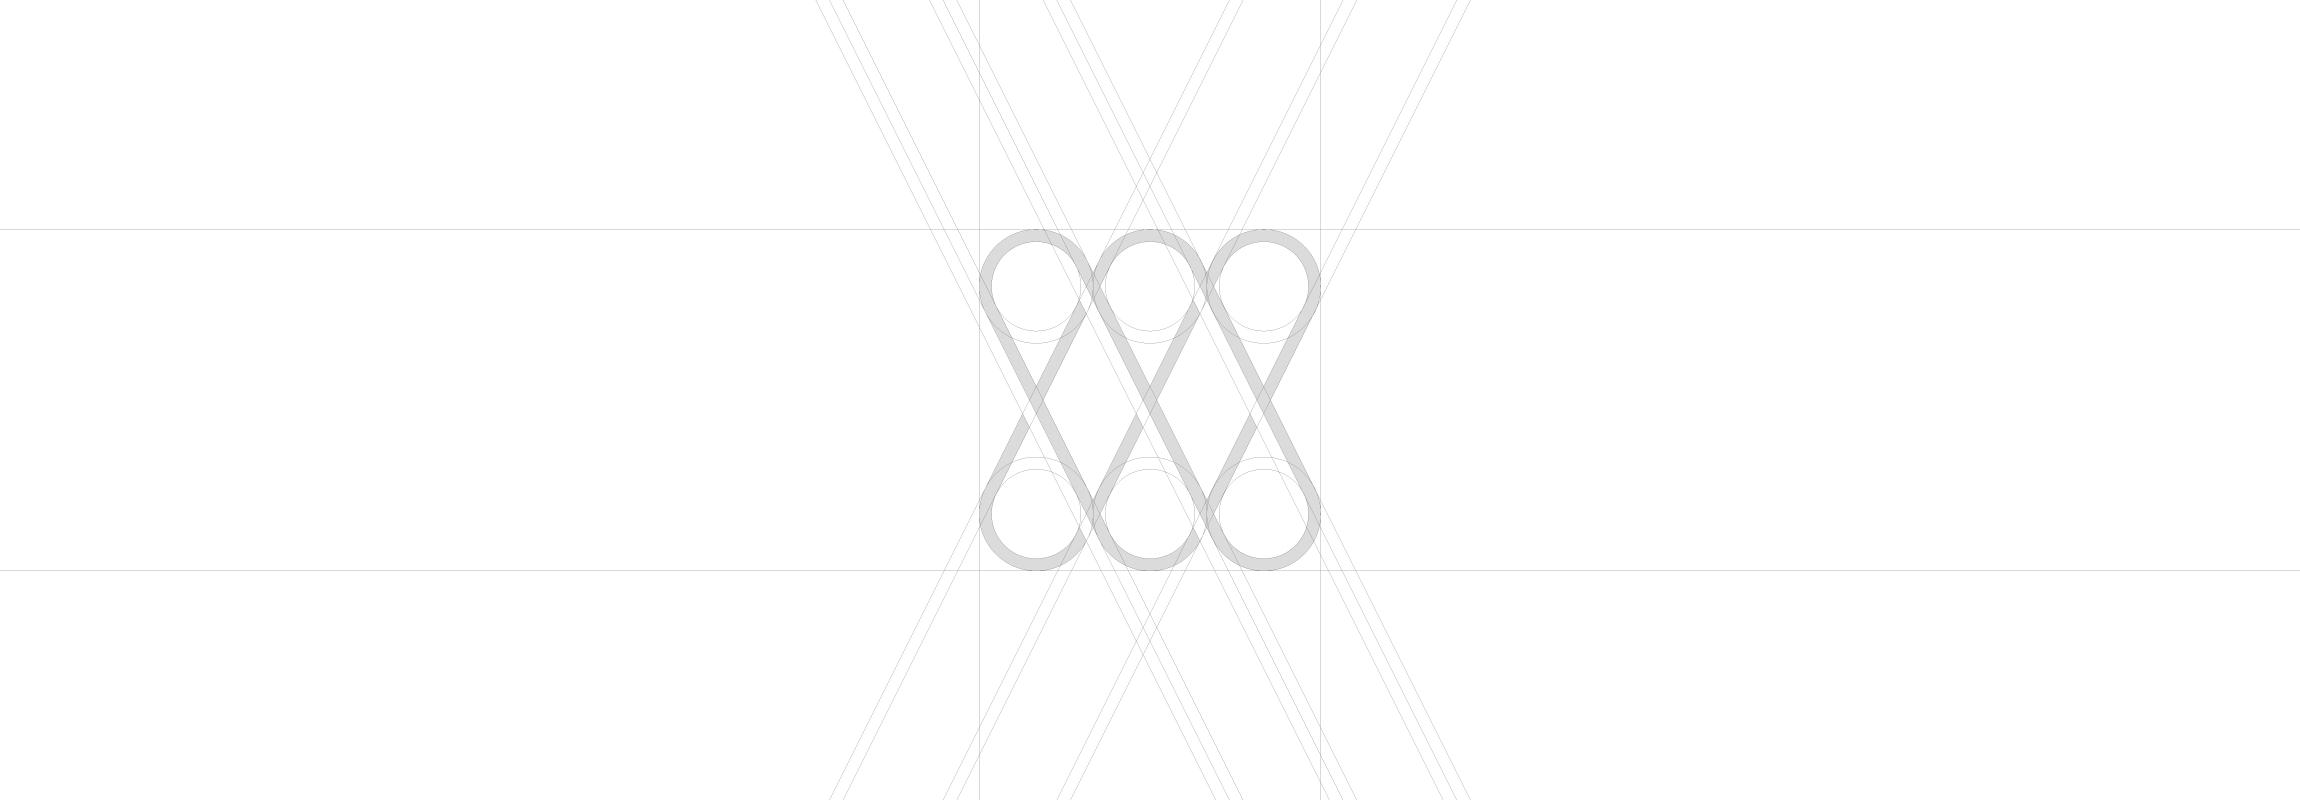 vilagestio_3-logo